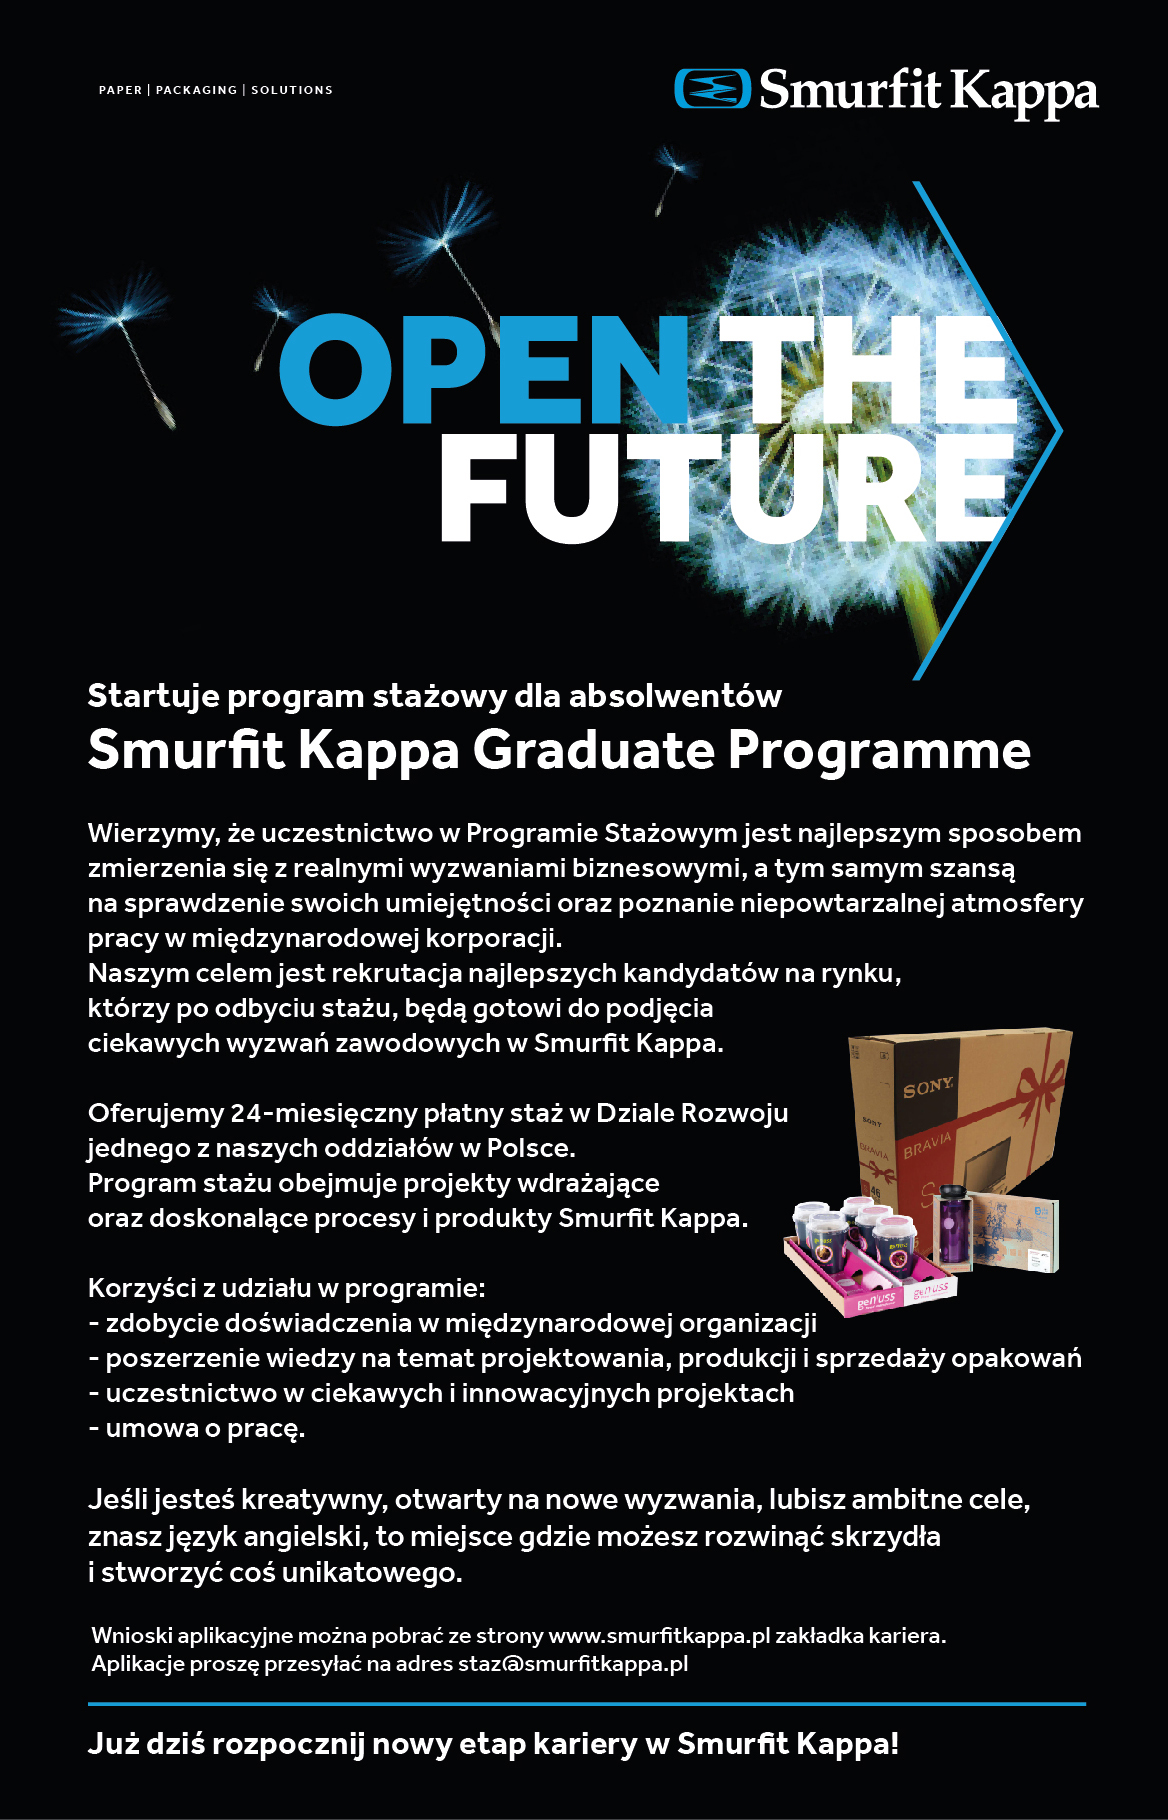 Smurfit Kappa Graduate Programme